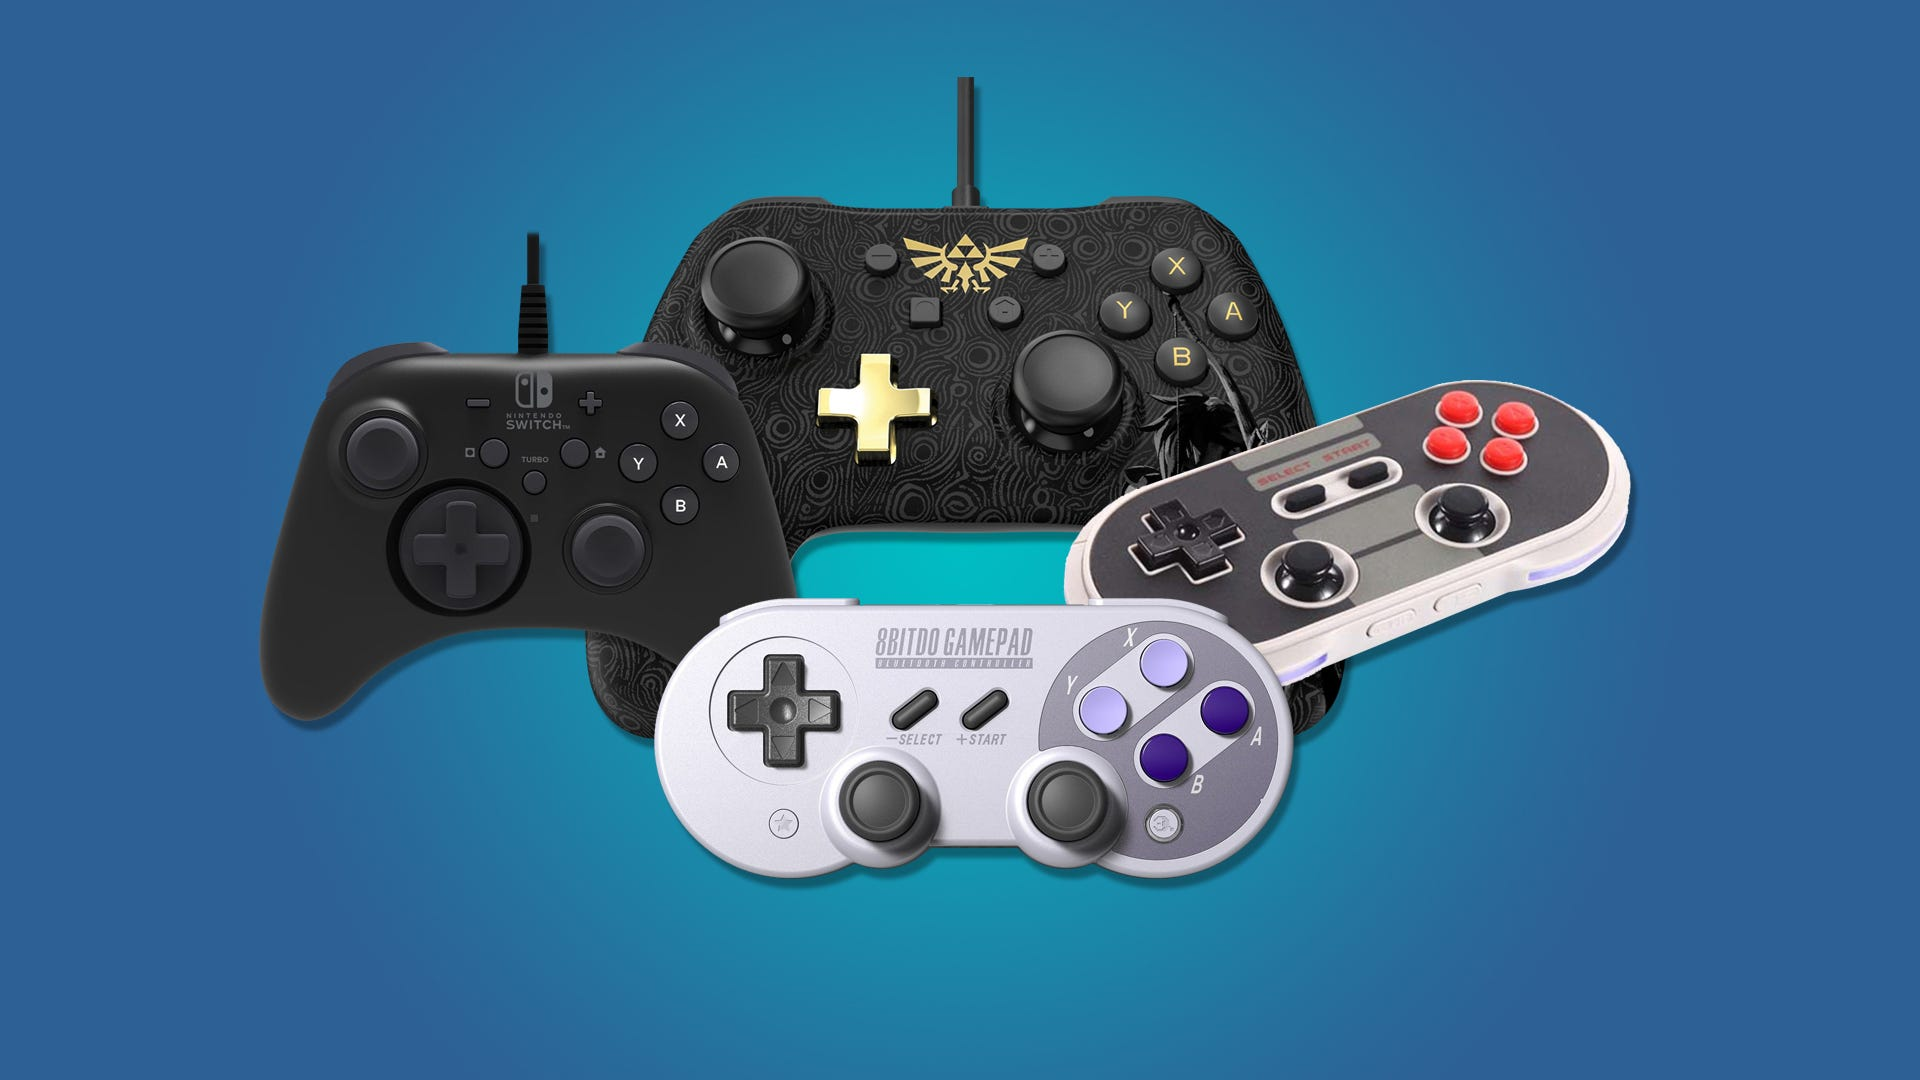 The Best Cheaper Alternatives To Nintendo Switch Pro Controller 8 Way Joystick